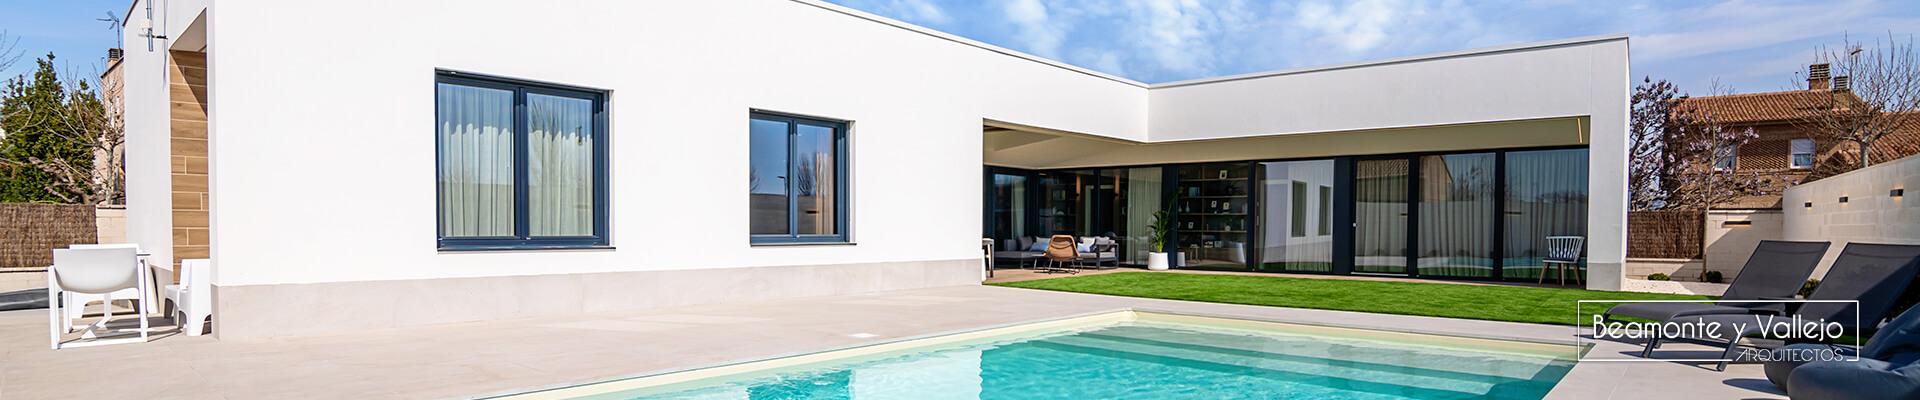 Arquitectos de viviendas passivhaus en Zaragoza